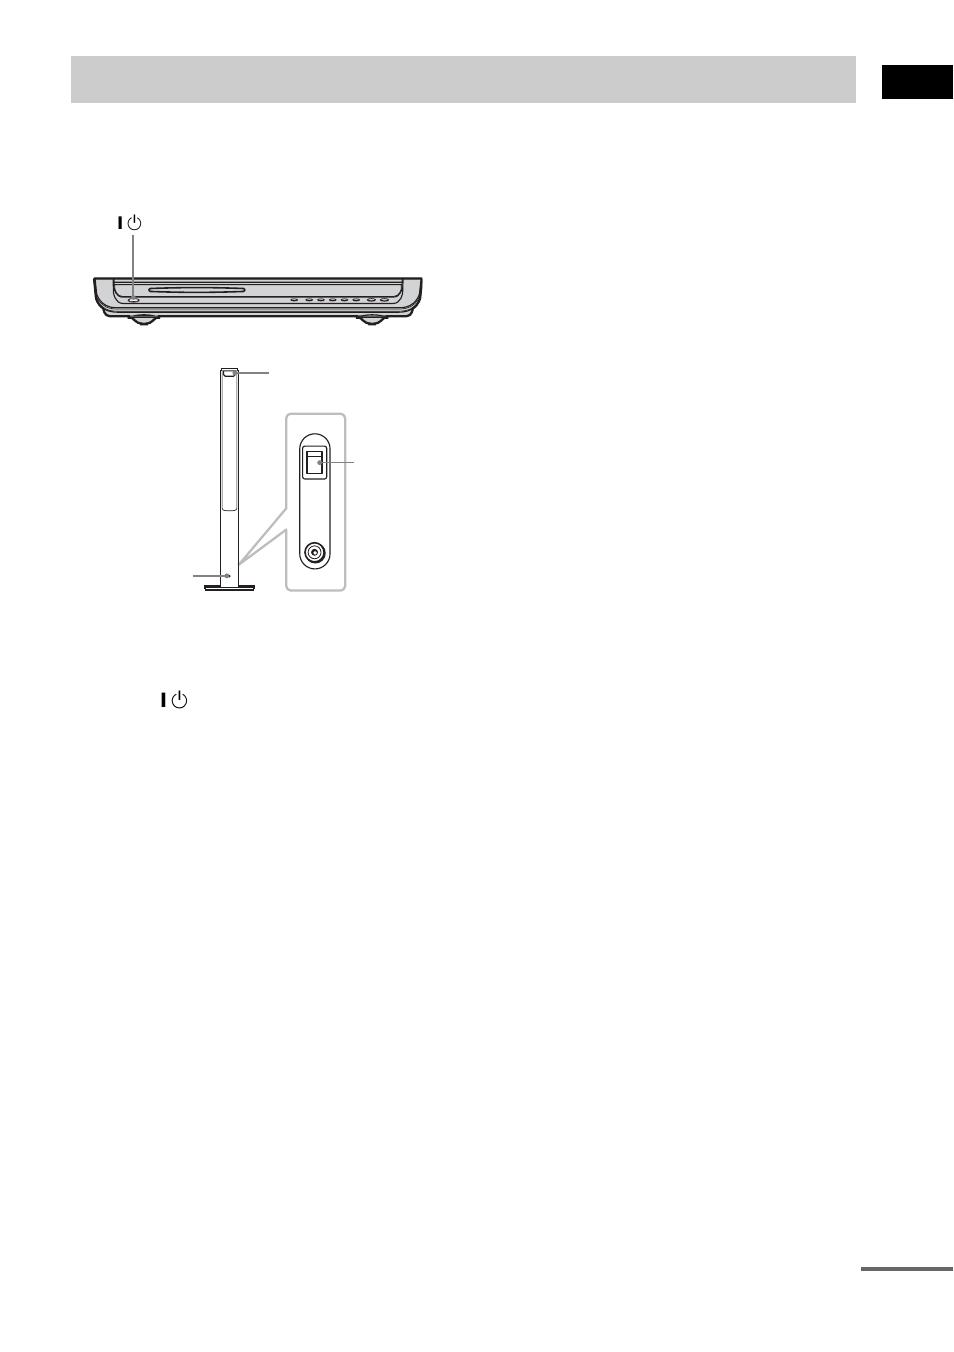 step 5 adjusting the wireless system step 5 adjusting the rh manualsdir com GE Speaker Oval GE Dynapower Speaker